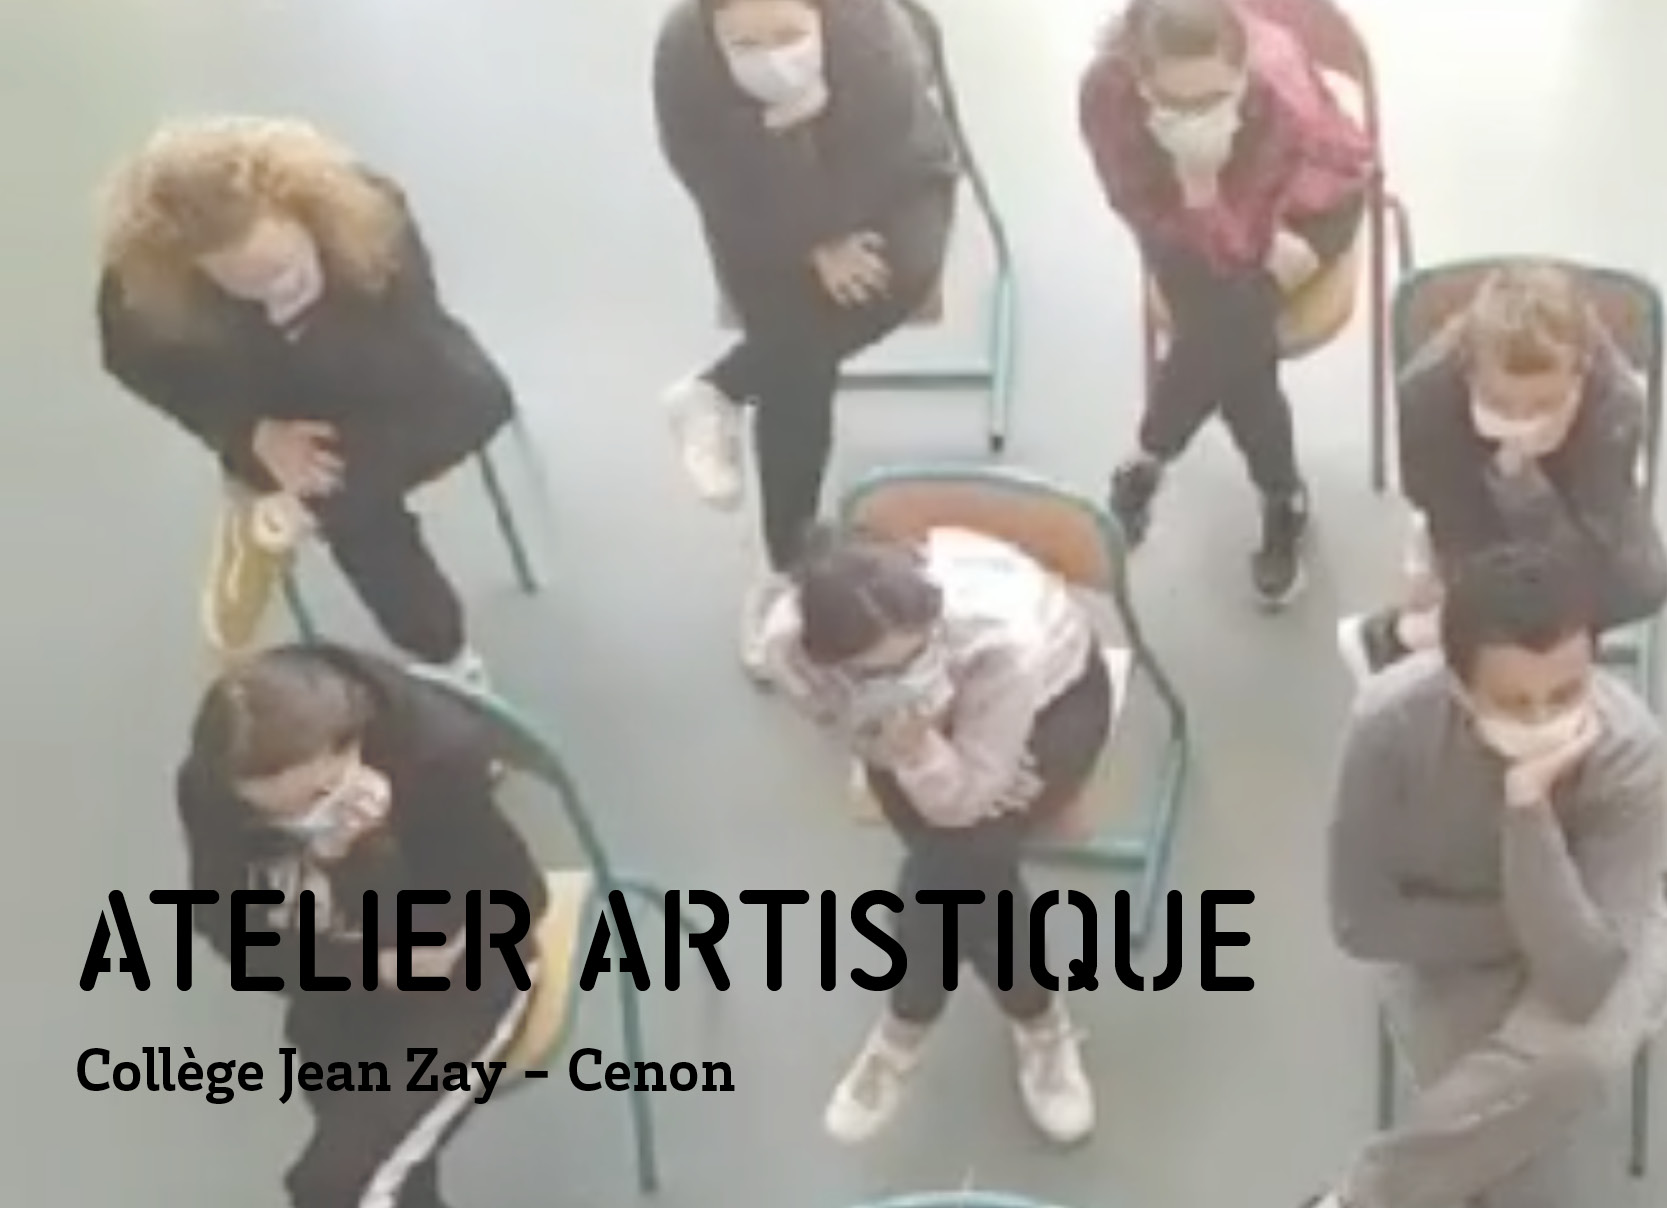 Collège Jean Zay